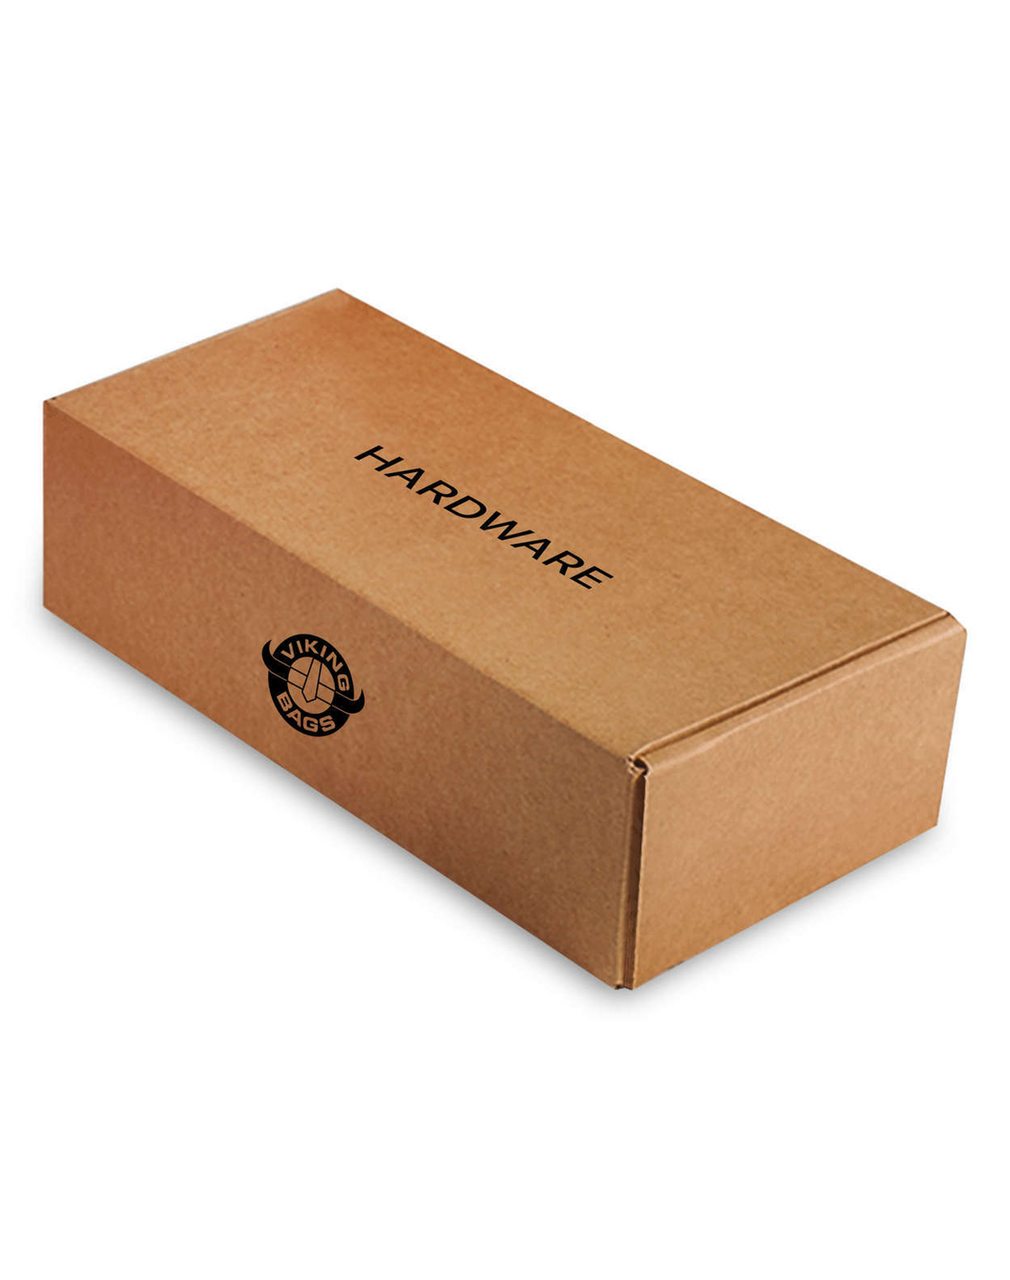 Honda VTX 1800 F Viking Lamellar Large Leather Covered Hard Saddlebags Hardware Box